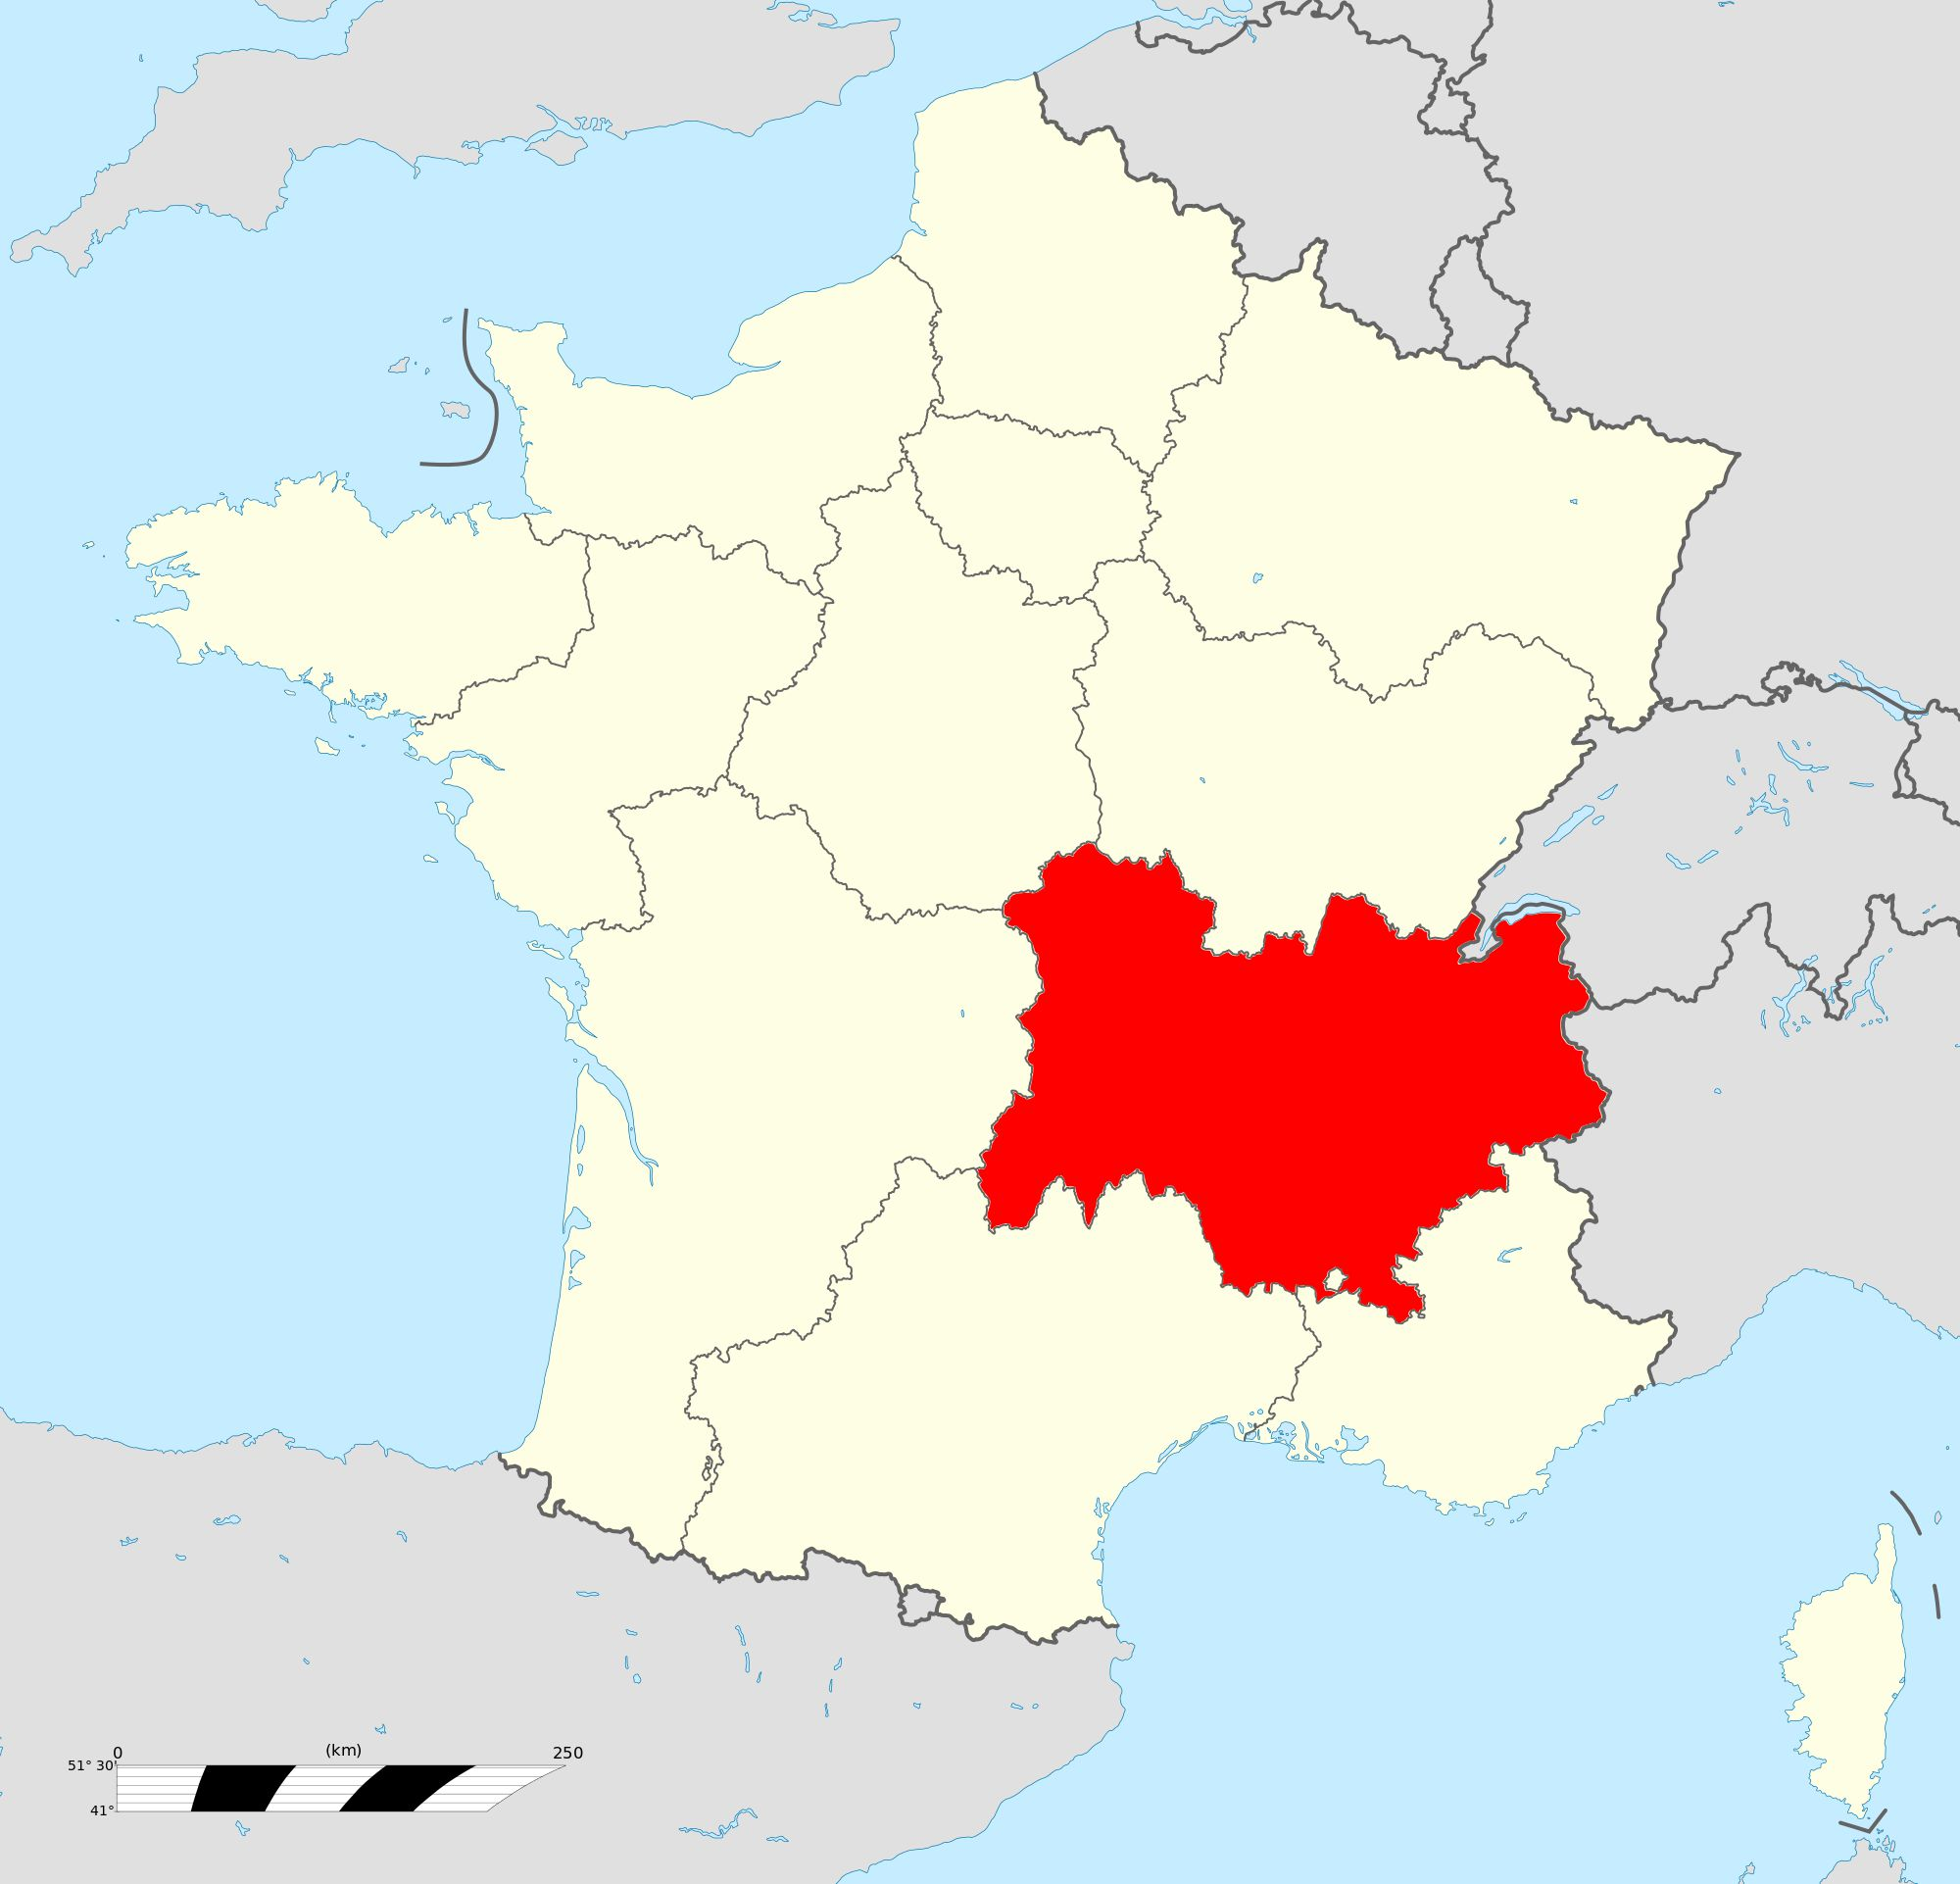 Où se trouve l'Auvergne-Rhône-Alpes